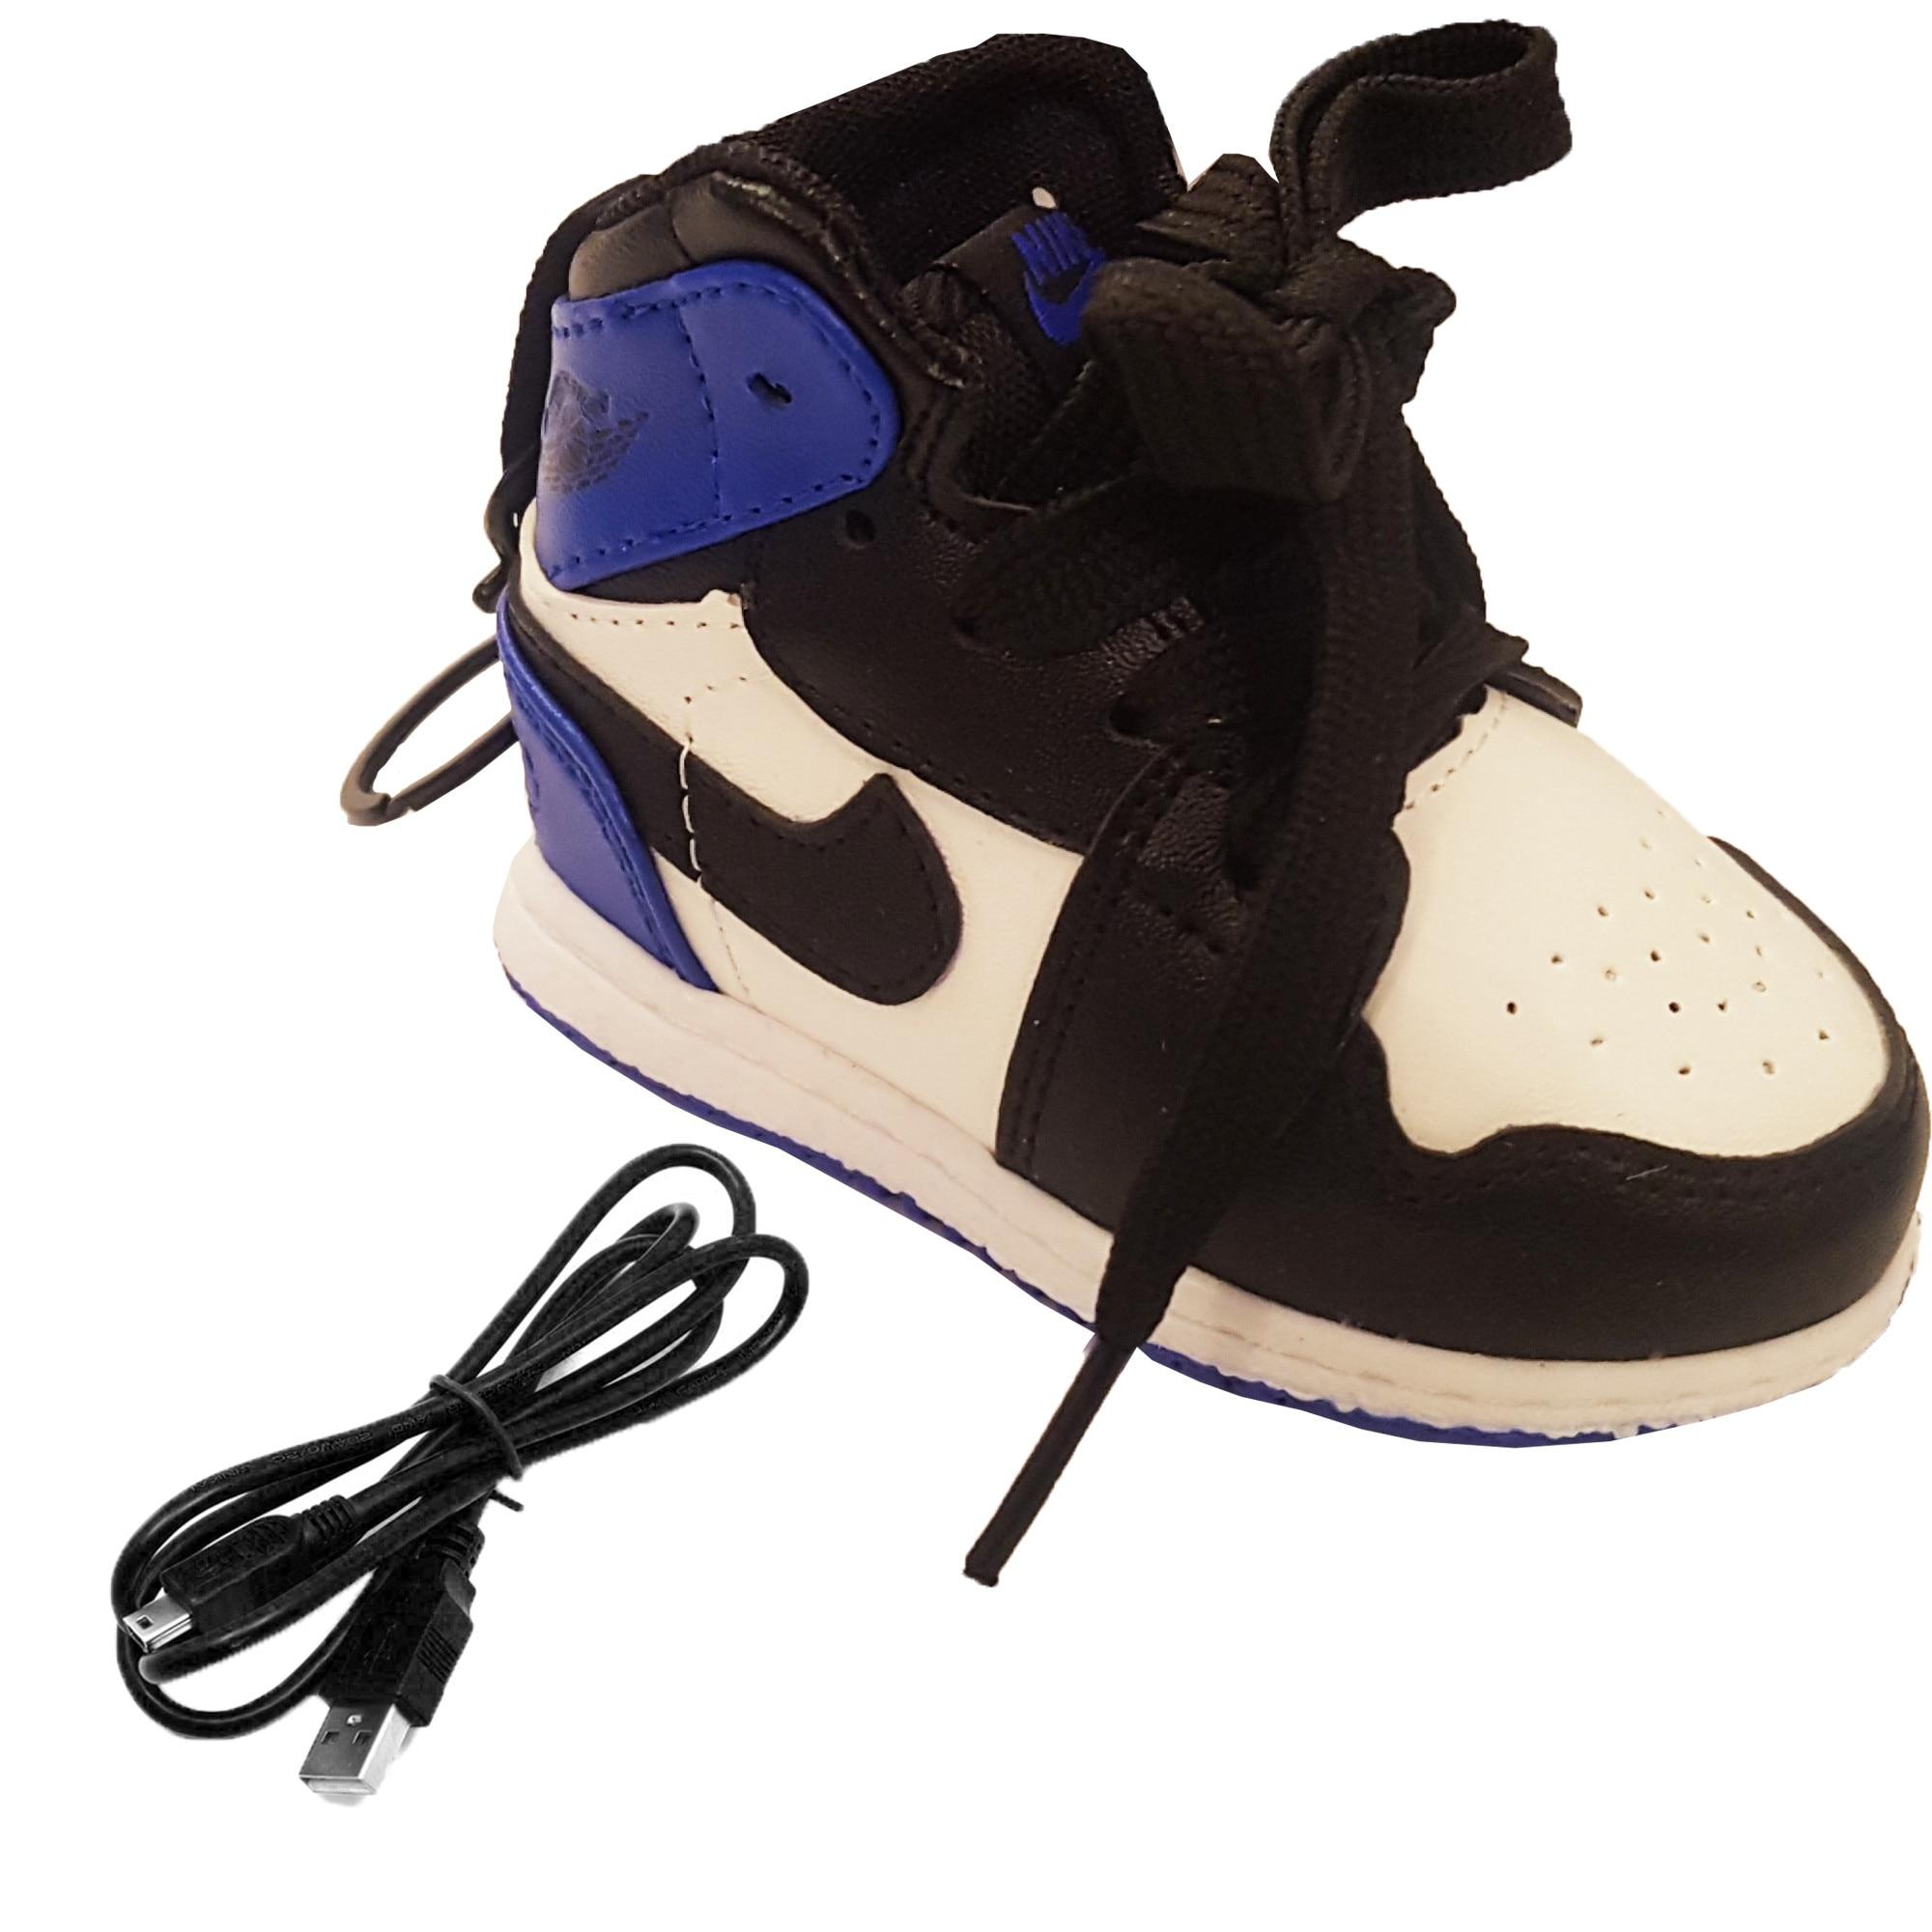 Pickering gelé Havs Anemon  Power bank 8000 mAh Nike shoes tip breloc blue - eMAG.ro